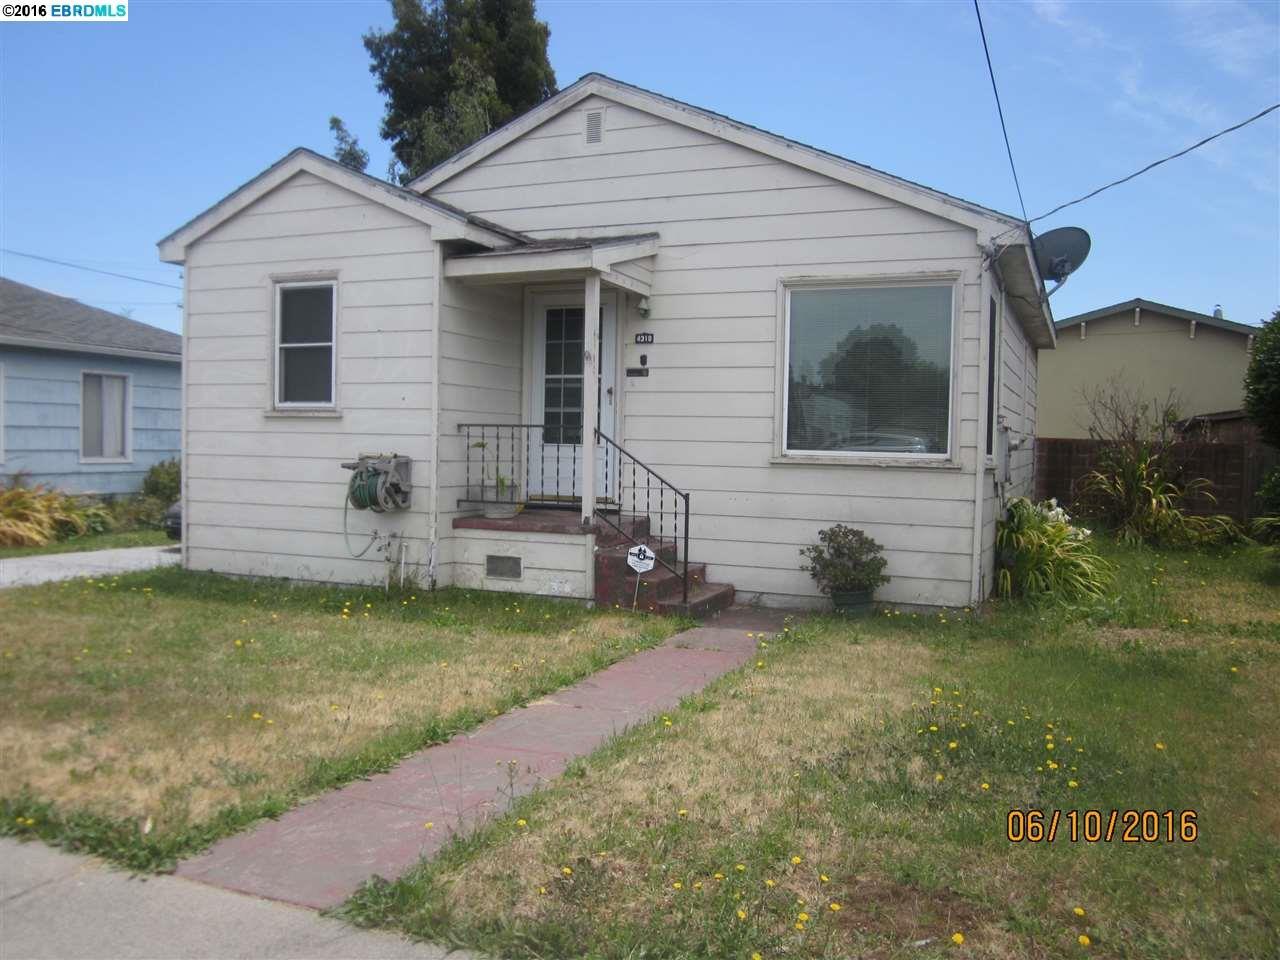 4310 ROOSEVELT AVE, RICHMOND, CA 94805